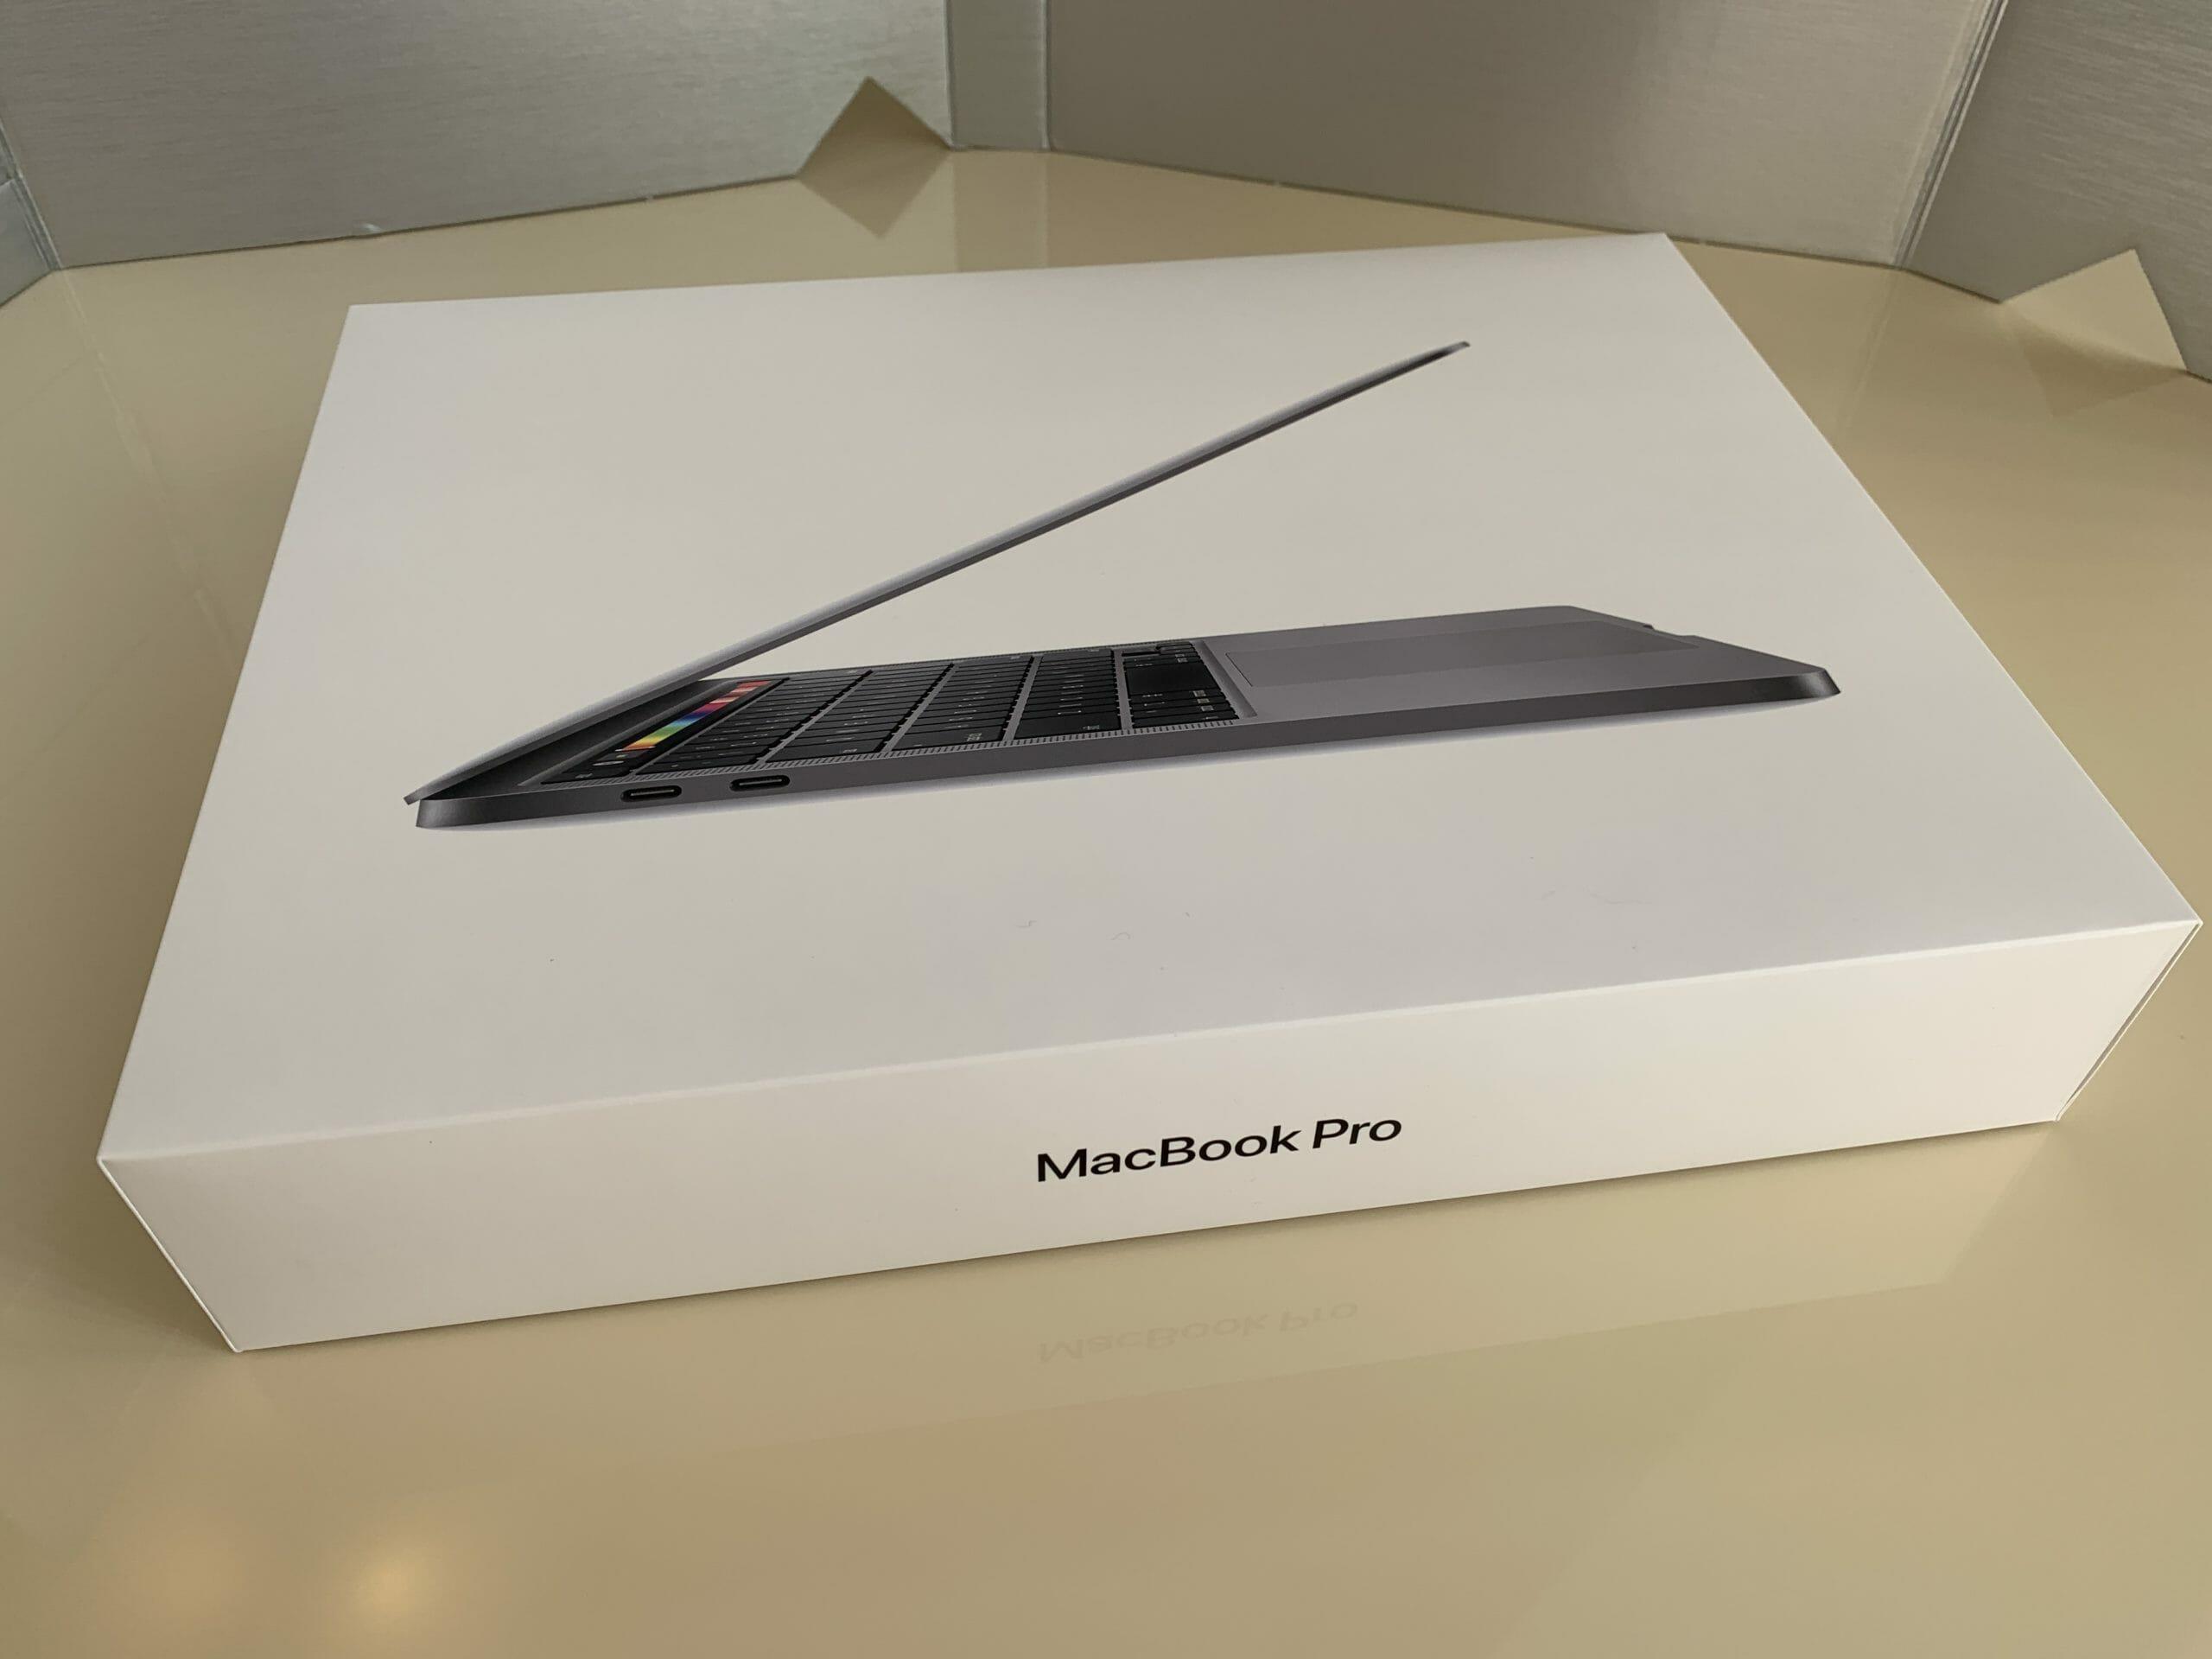 Pro 2020 macbook 13 インチ